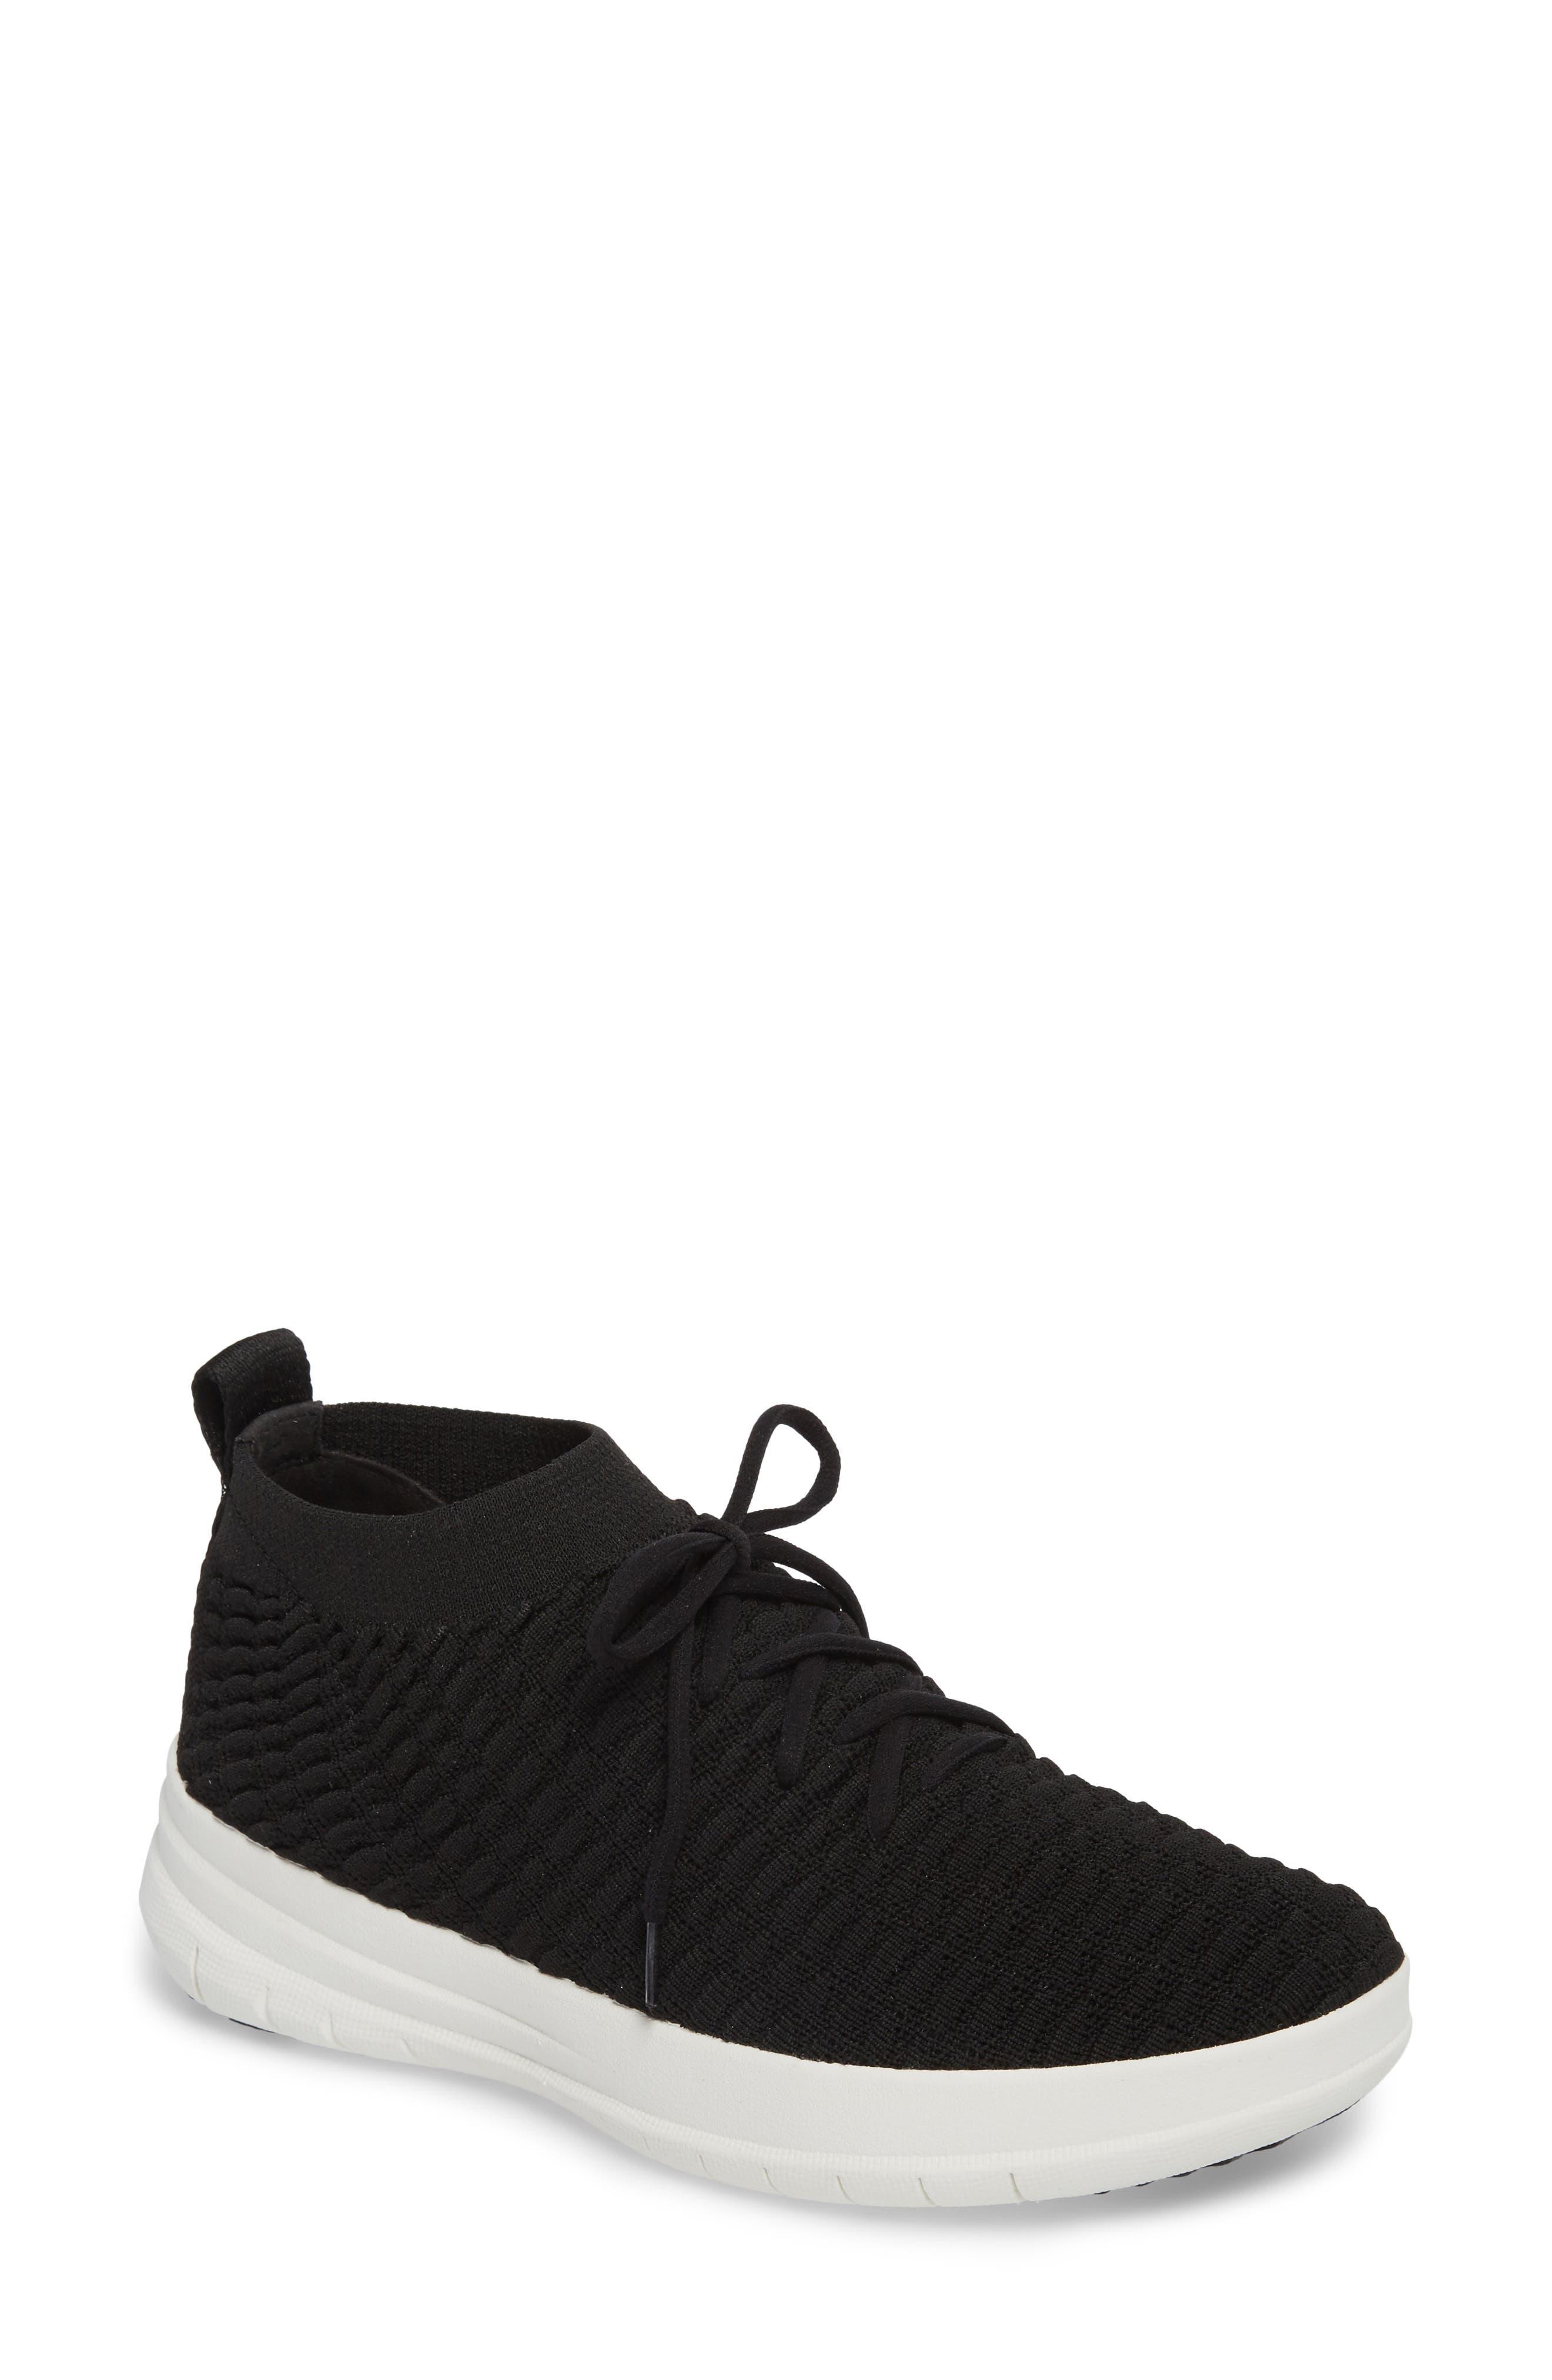 Uberknit<sup>™</sup> Slip-On High Top Sneaker,                             Main thumbnail 1, color,                             001